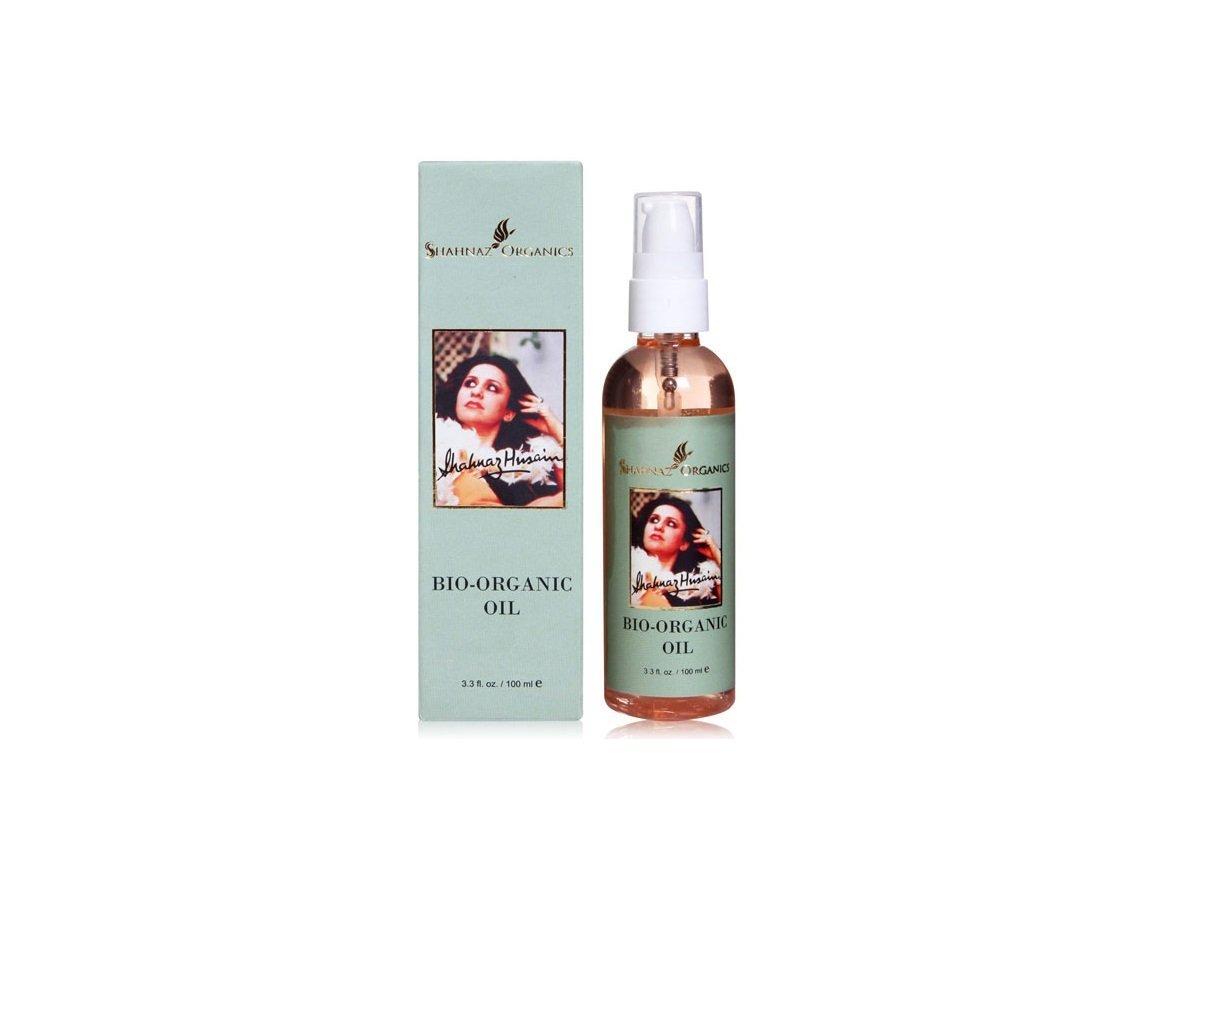 Shahnaz Husain Bio-Organic Oil for Youthful Skin (3.3 fl oz / 100 ml)